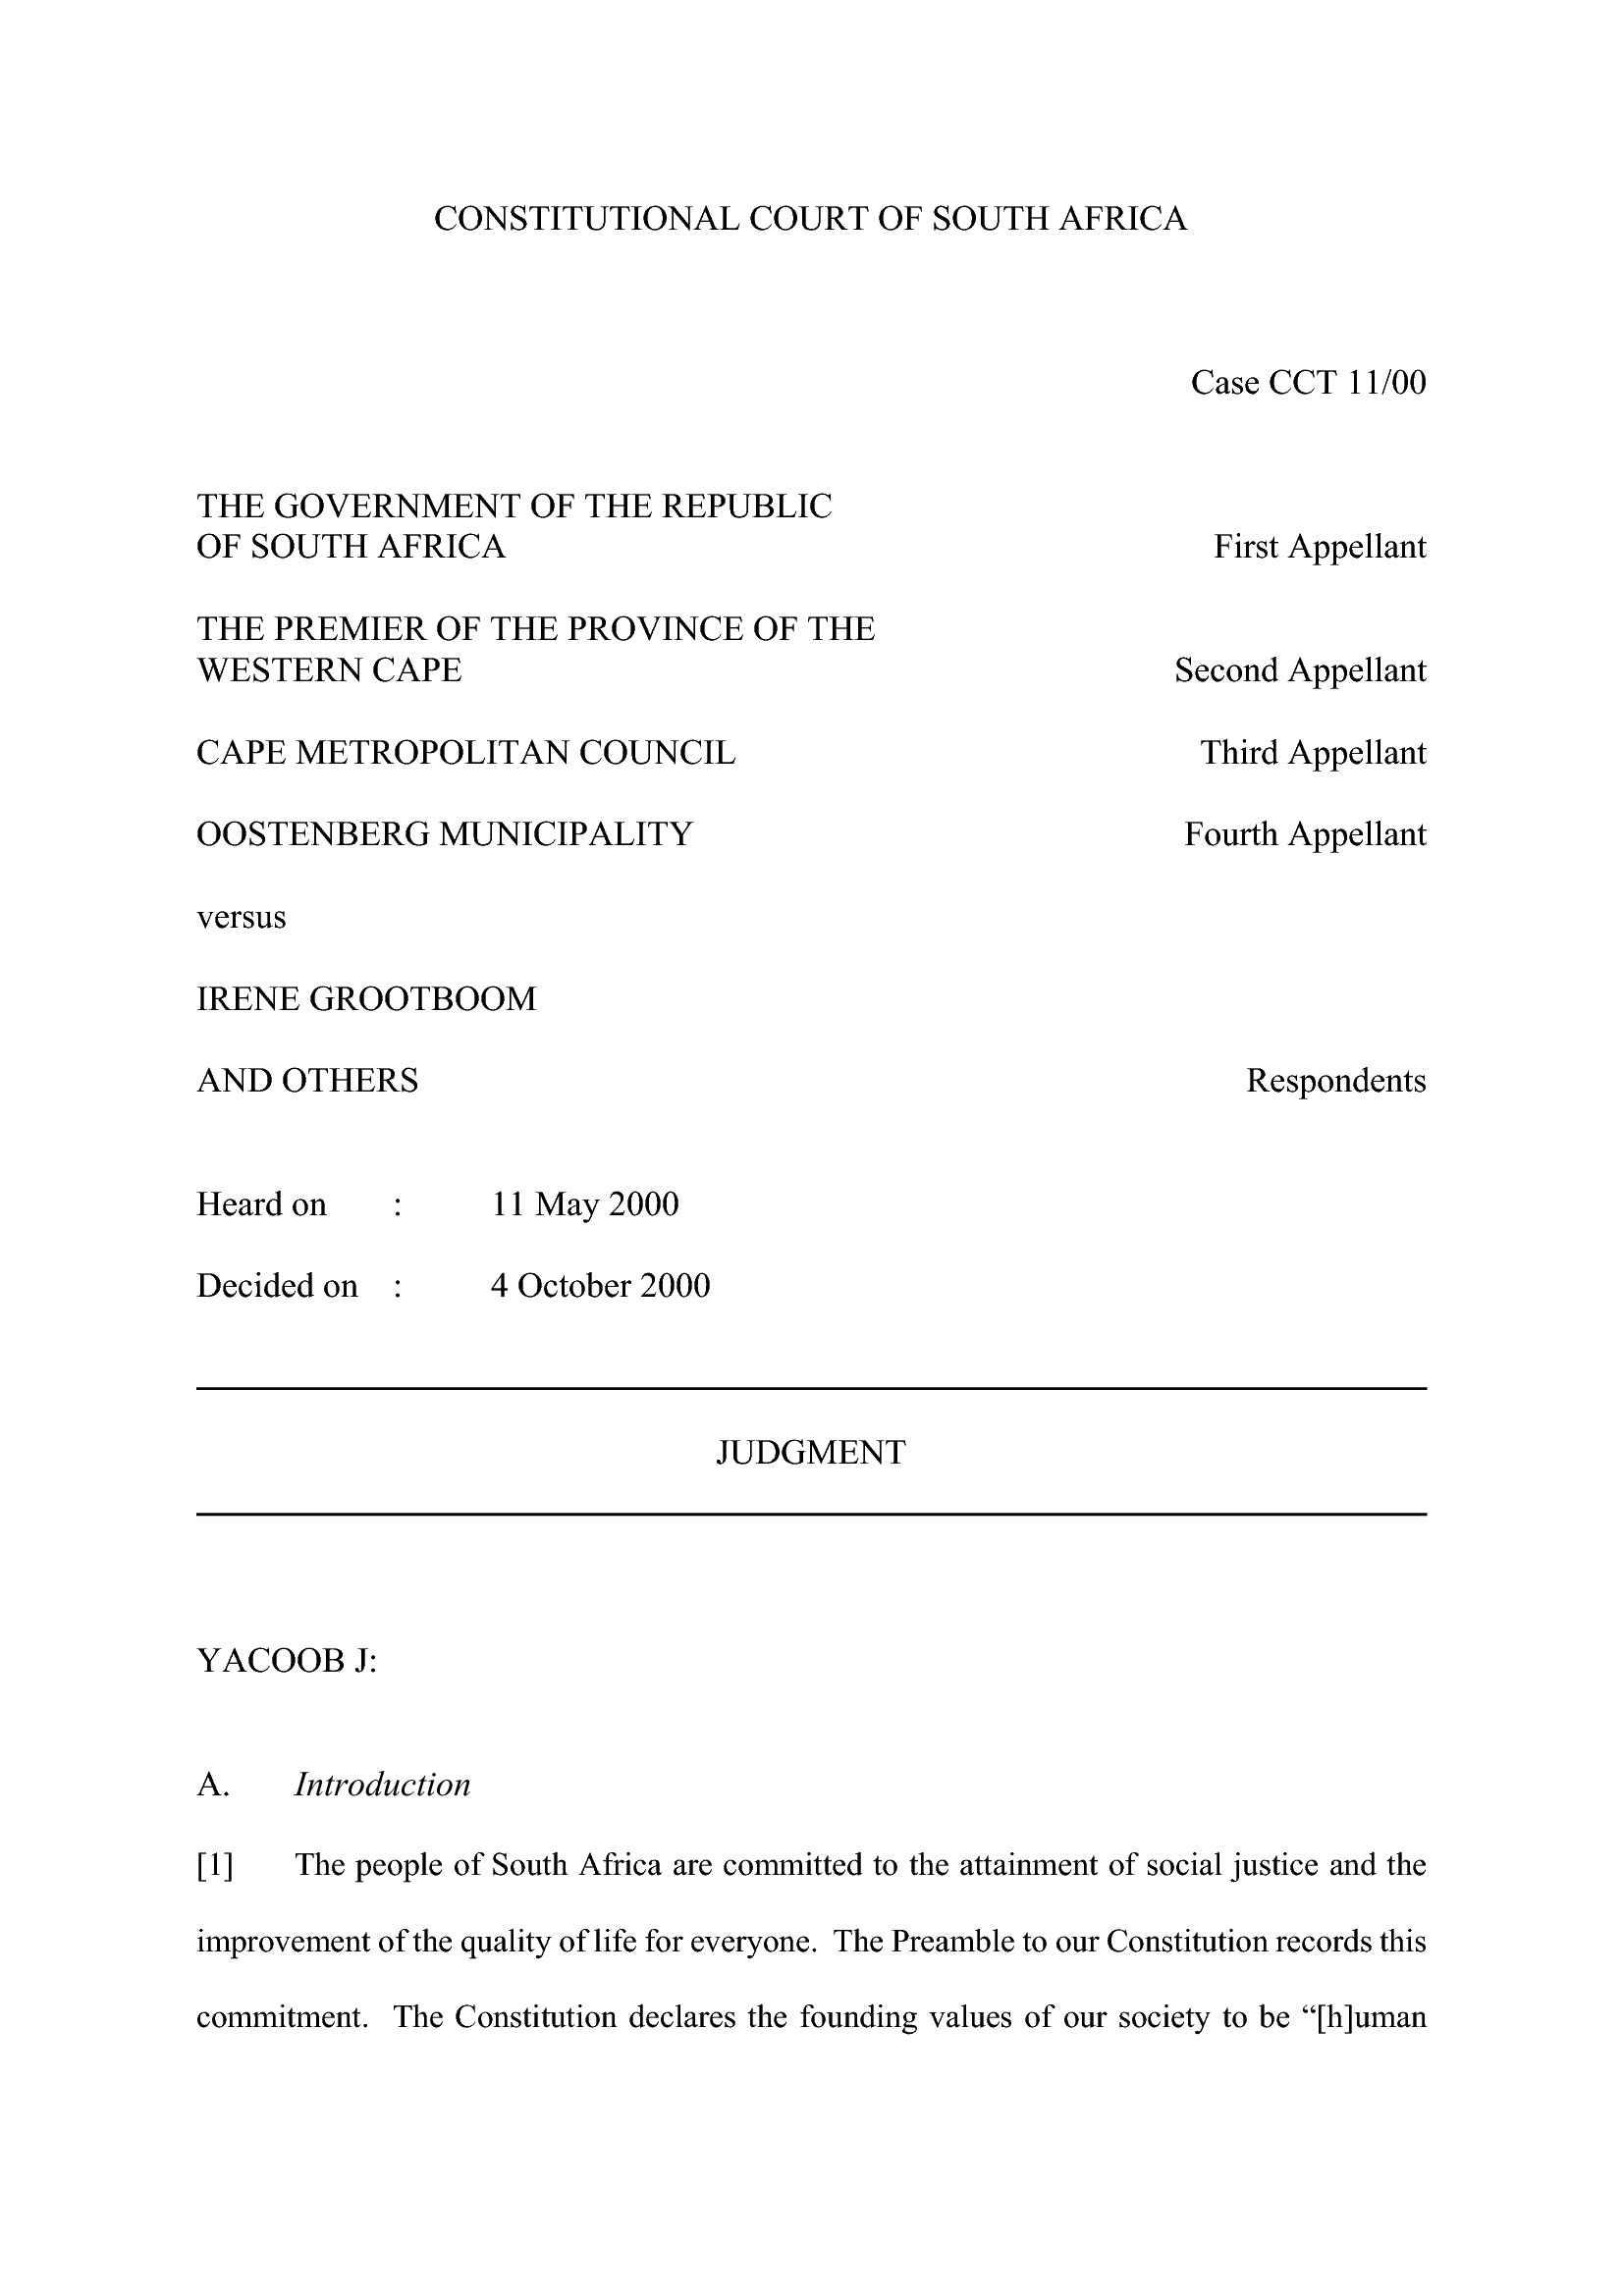 Corte Costituzionale Sud Africa - Caso 11/00